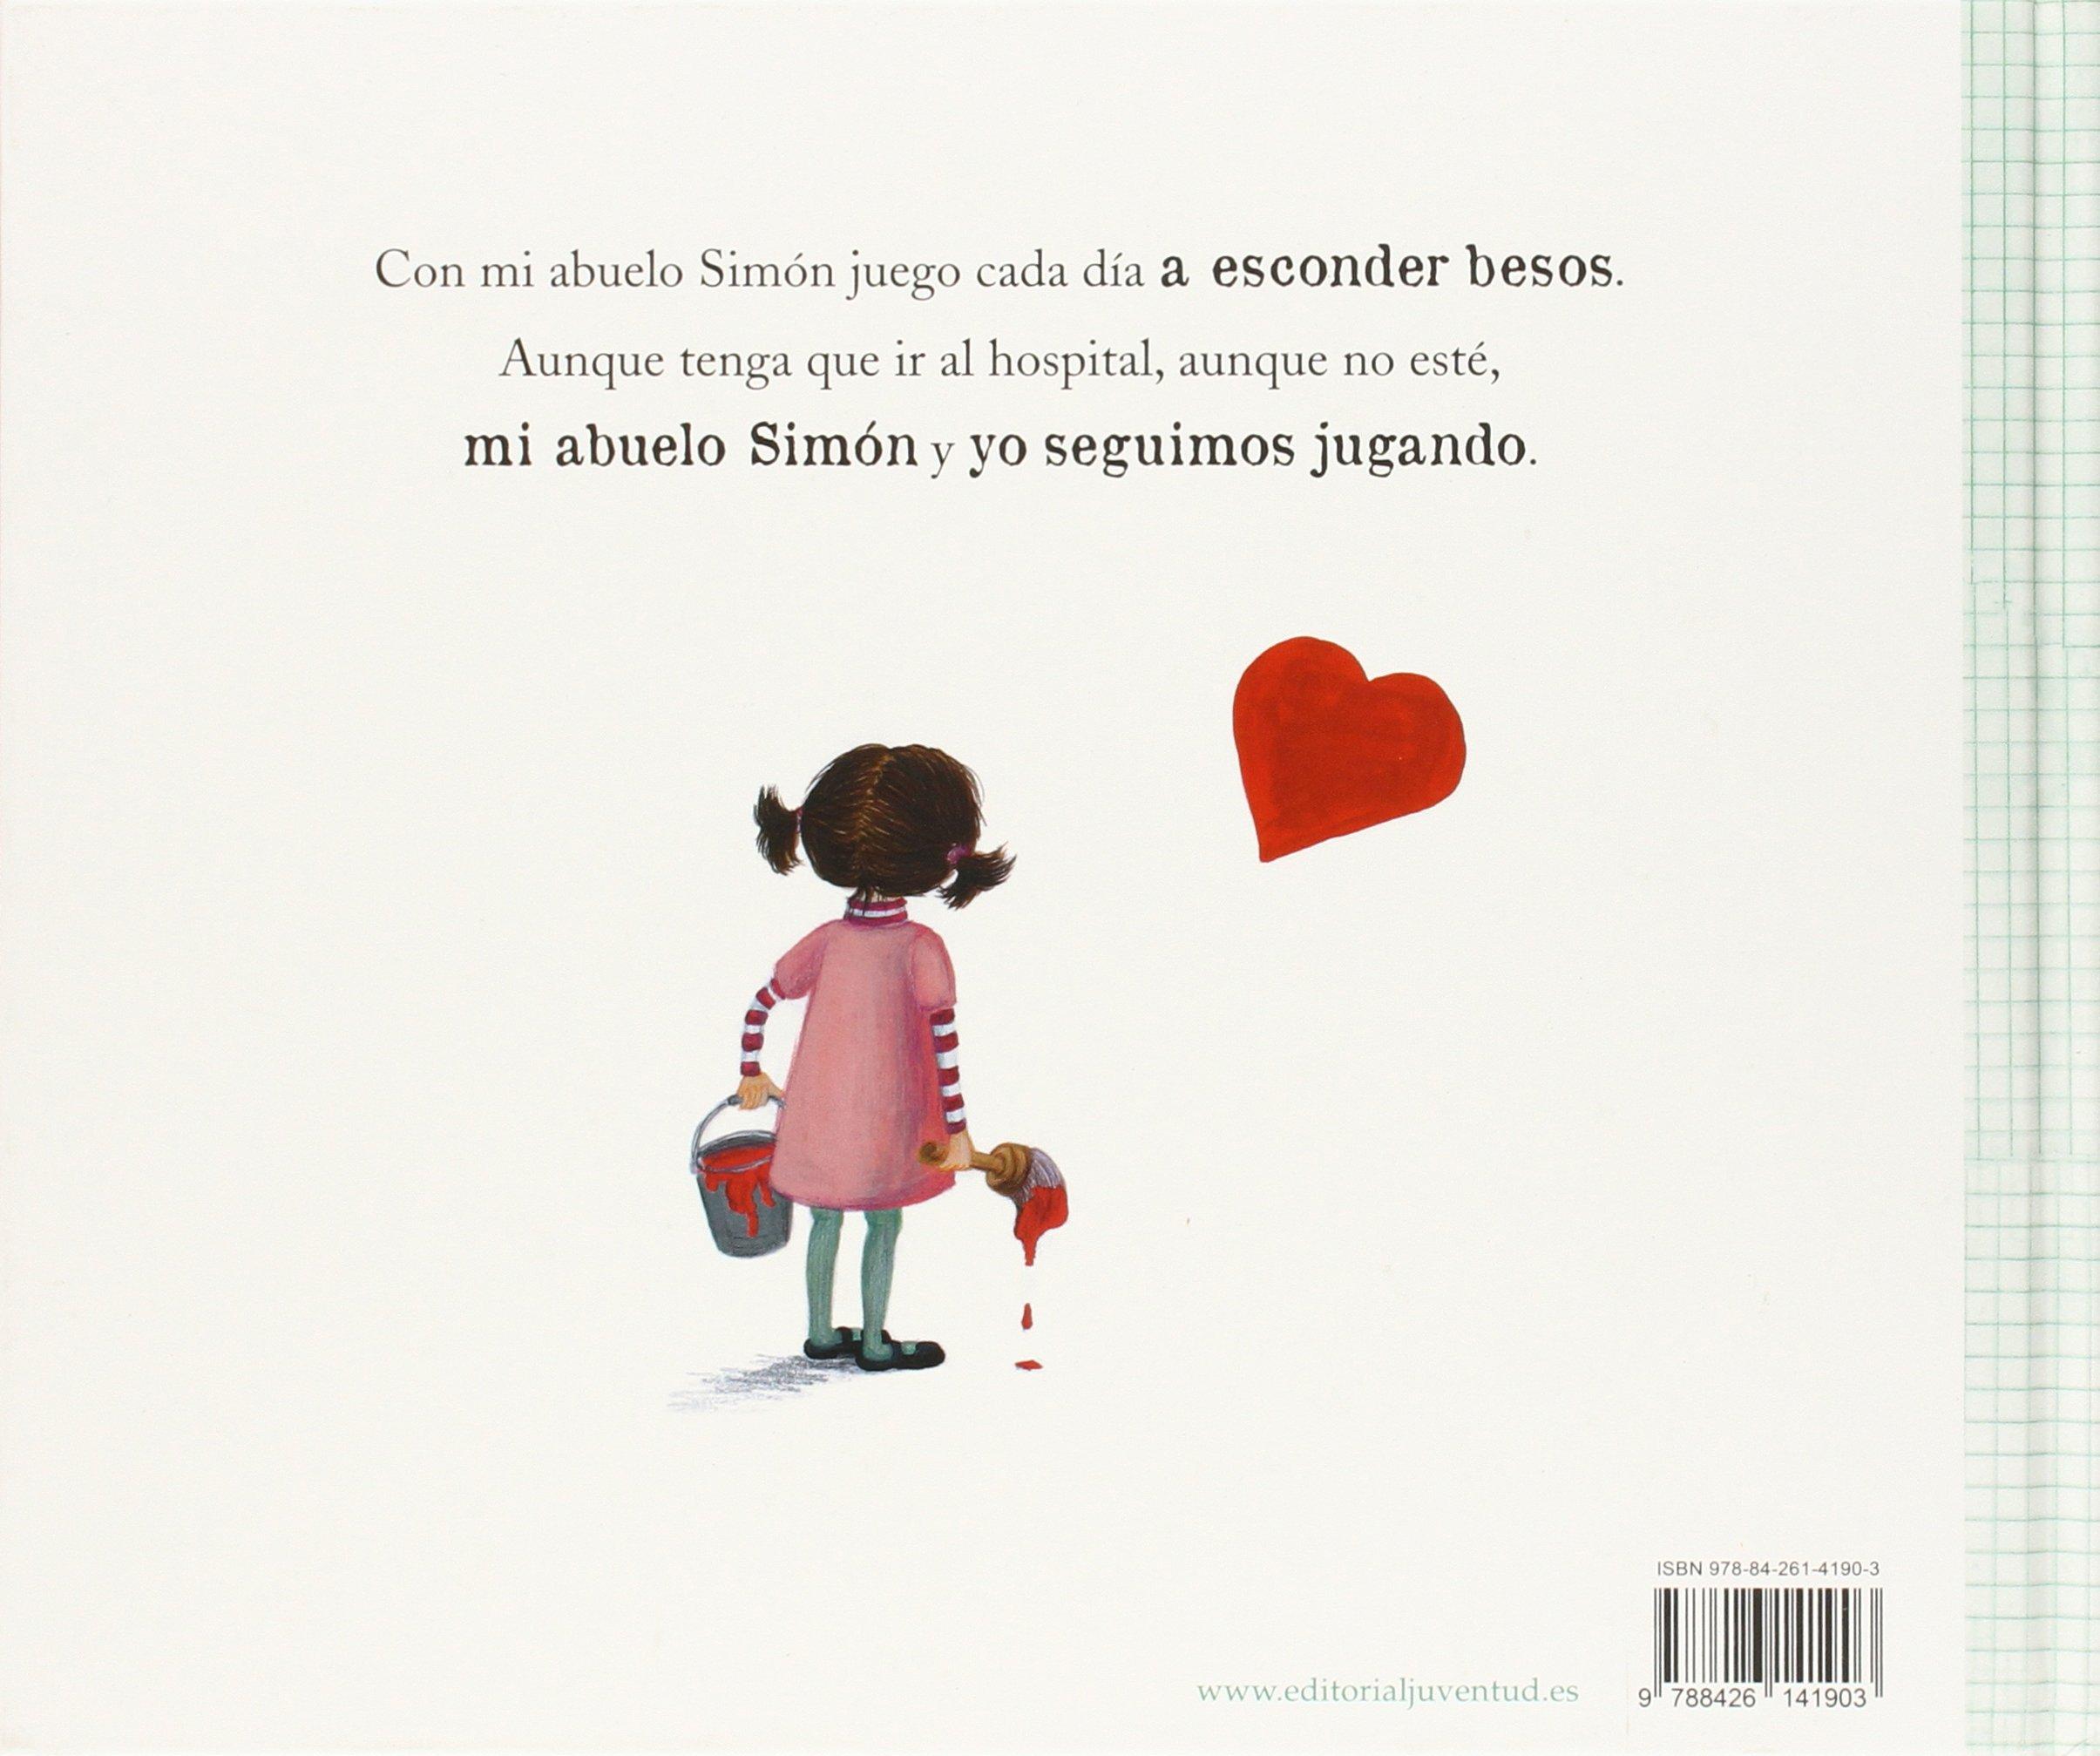 Mi Abuelo Y Yo álbumes Ilustrados Spanish Edition 9788426141903 Parera Ciuró Núria Suárez Jiménez Almudena Books